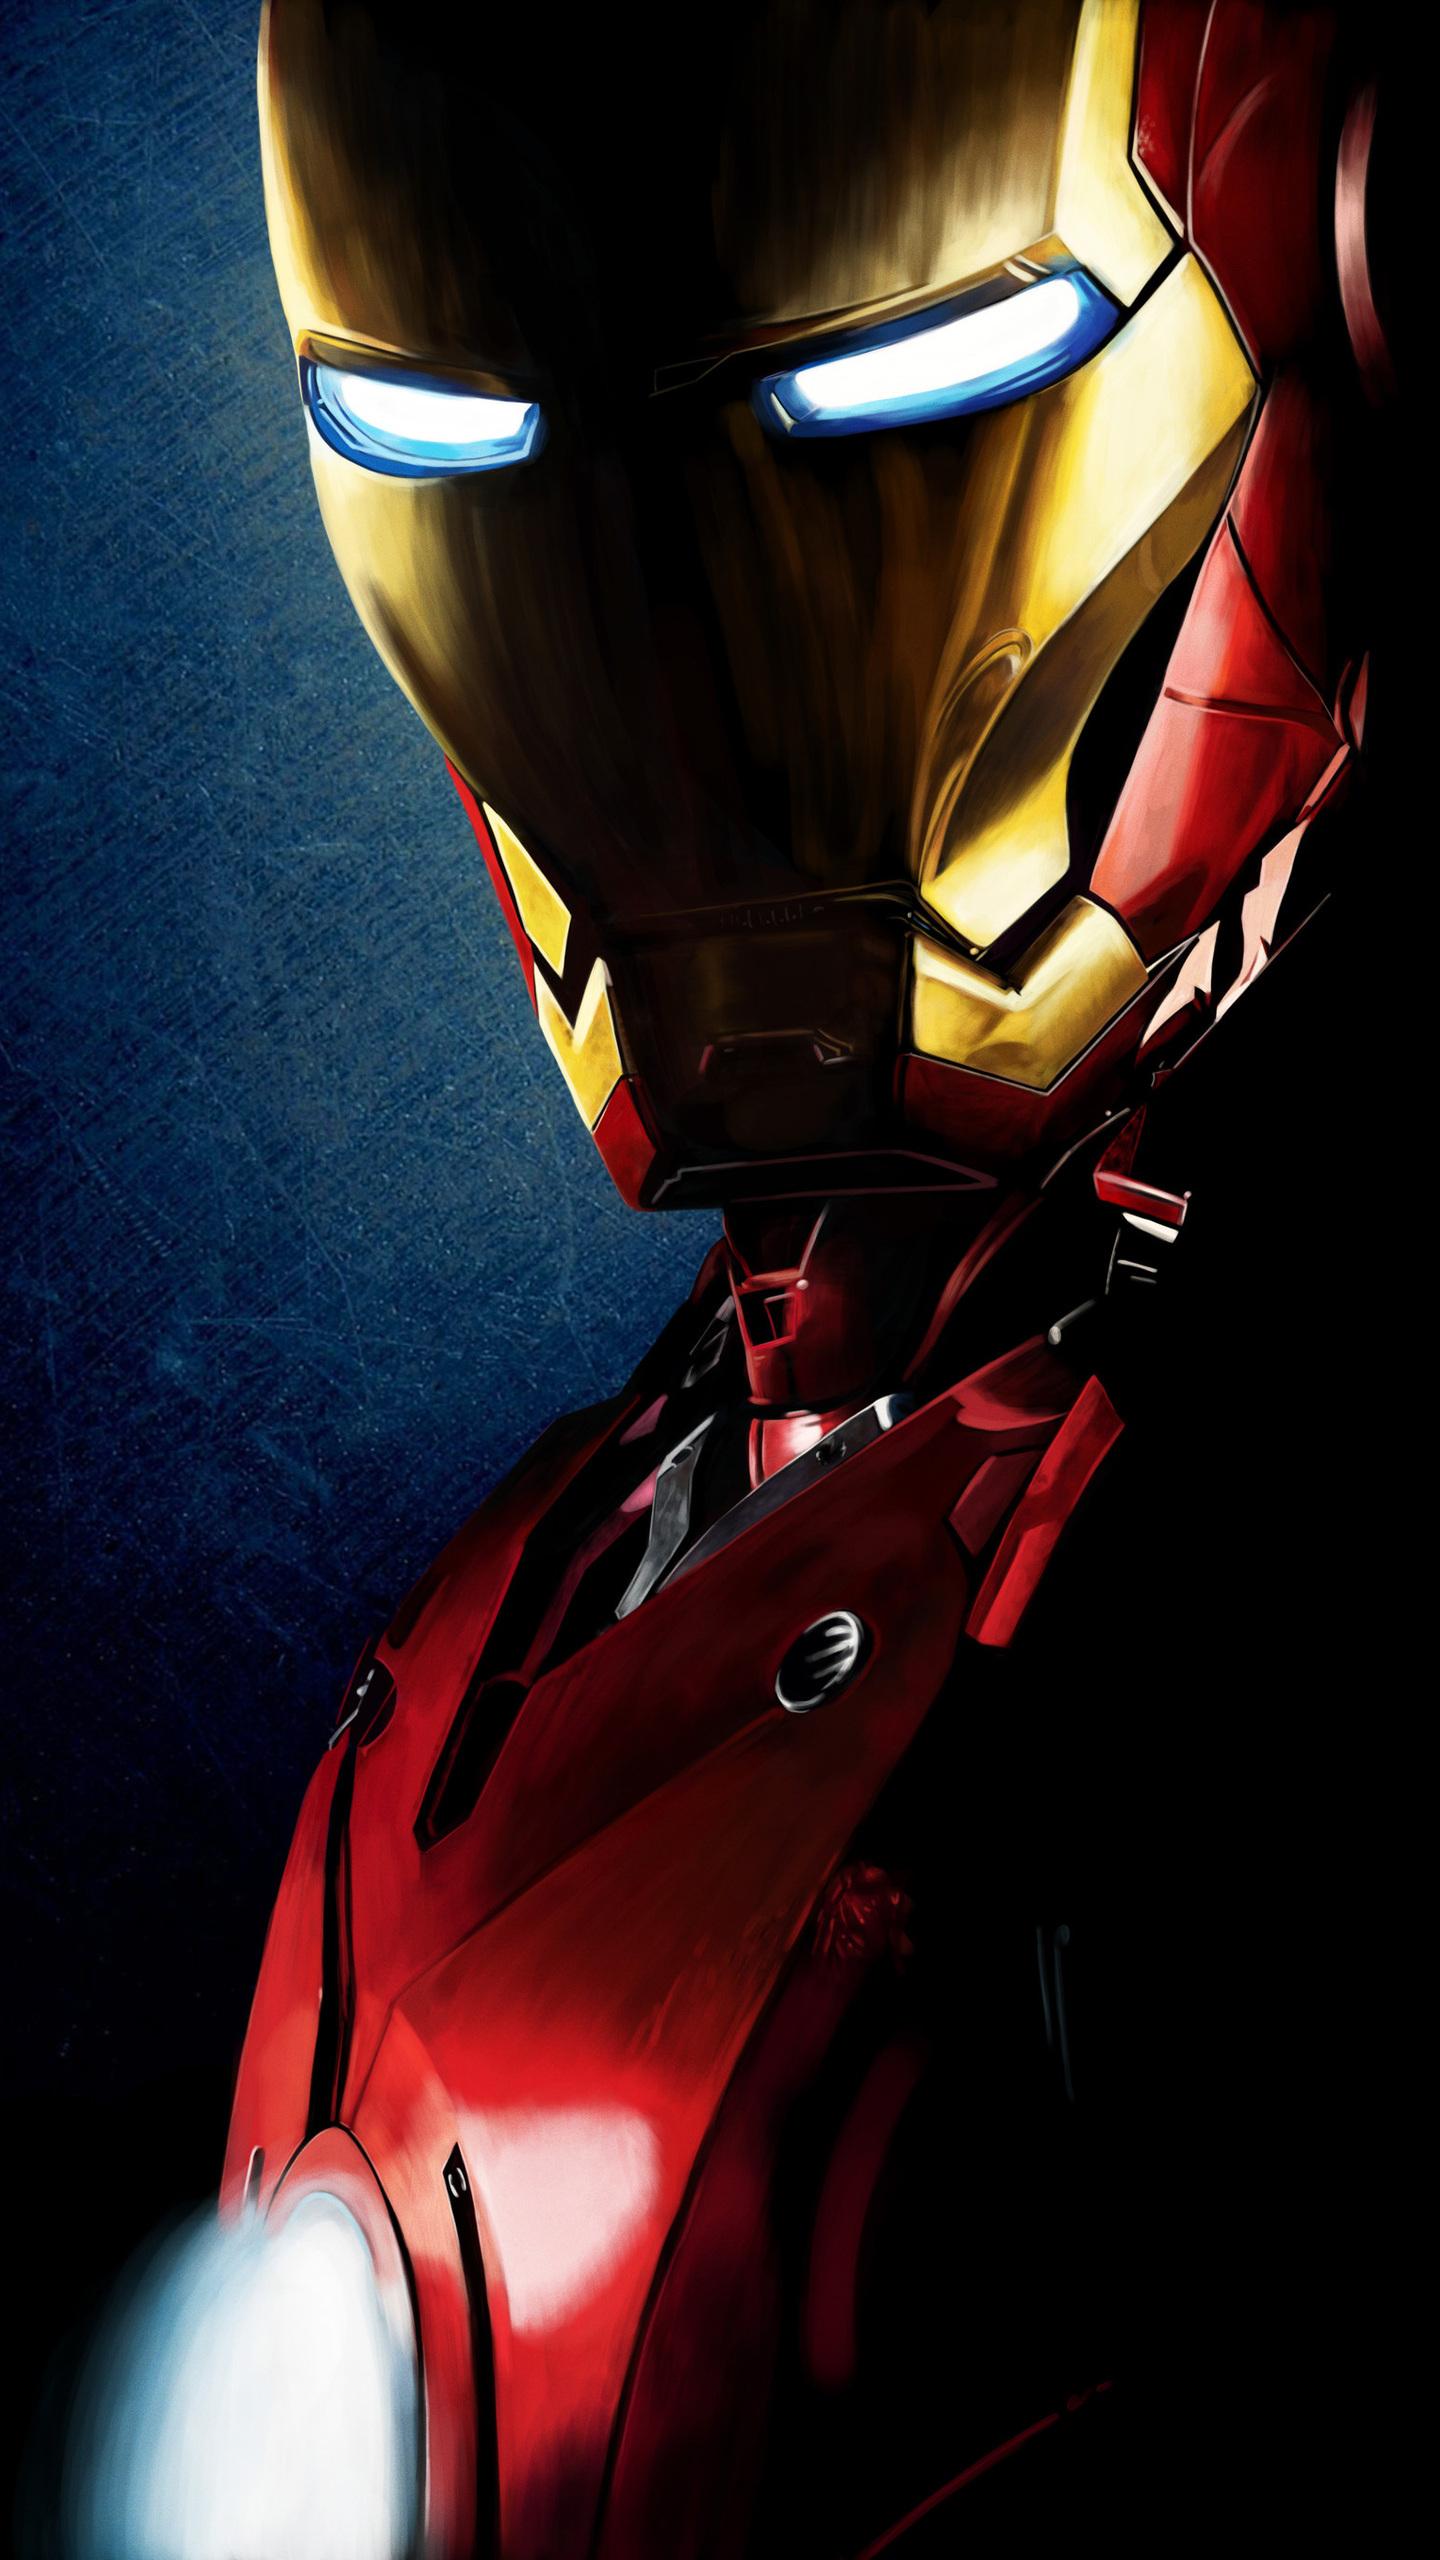 1440x2560 Iron Man 1080p Samsung Galaxy S6 S7 Google Pixel Xl